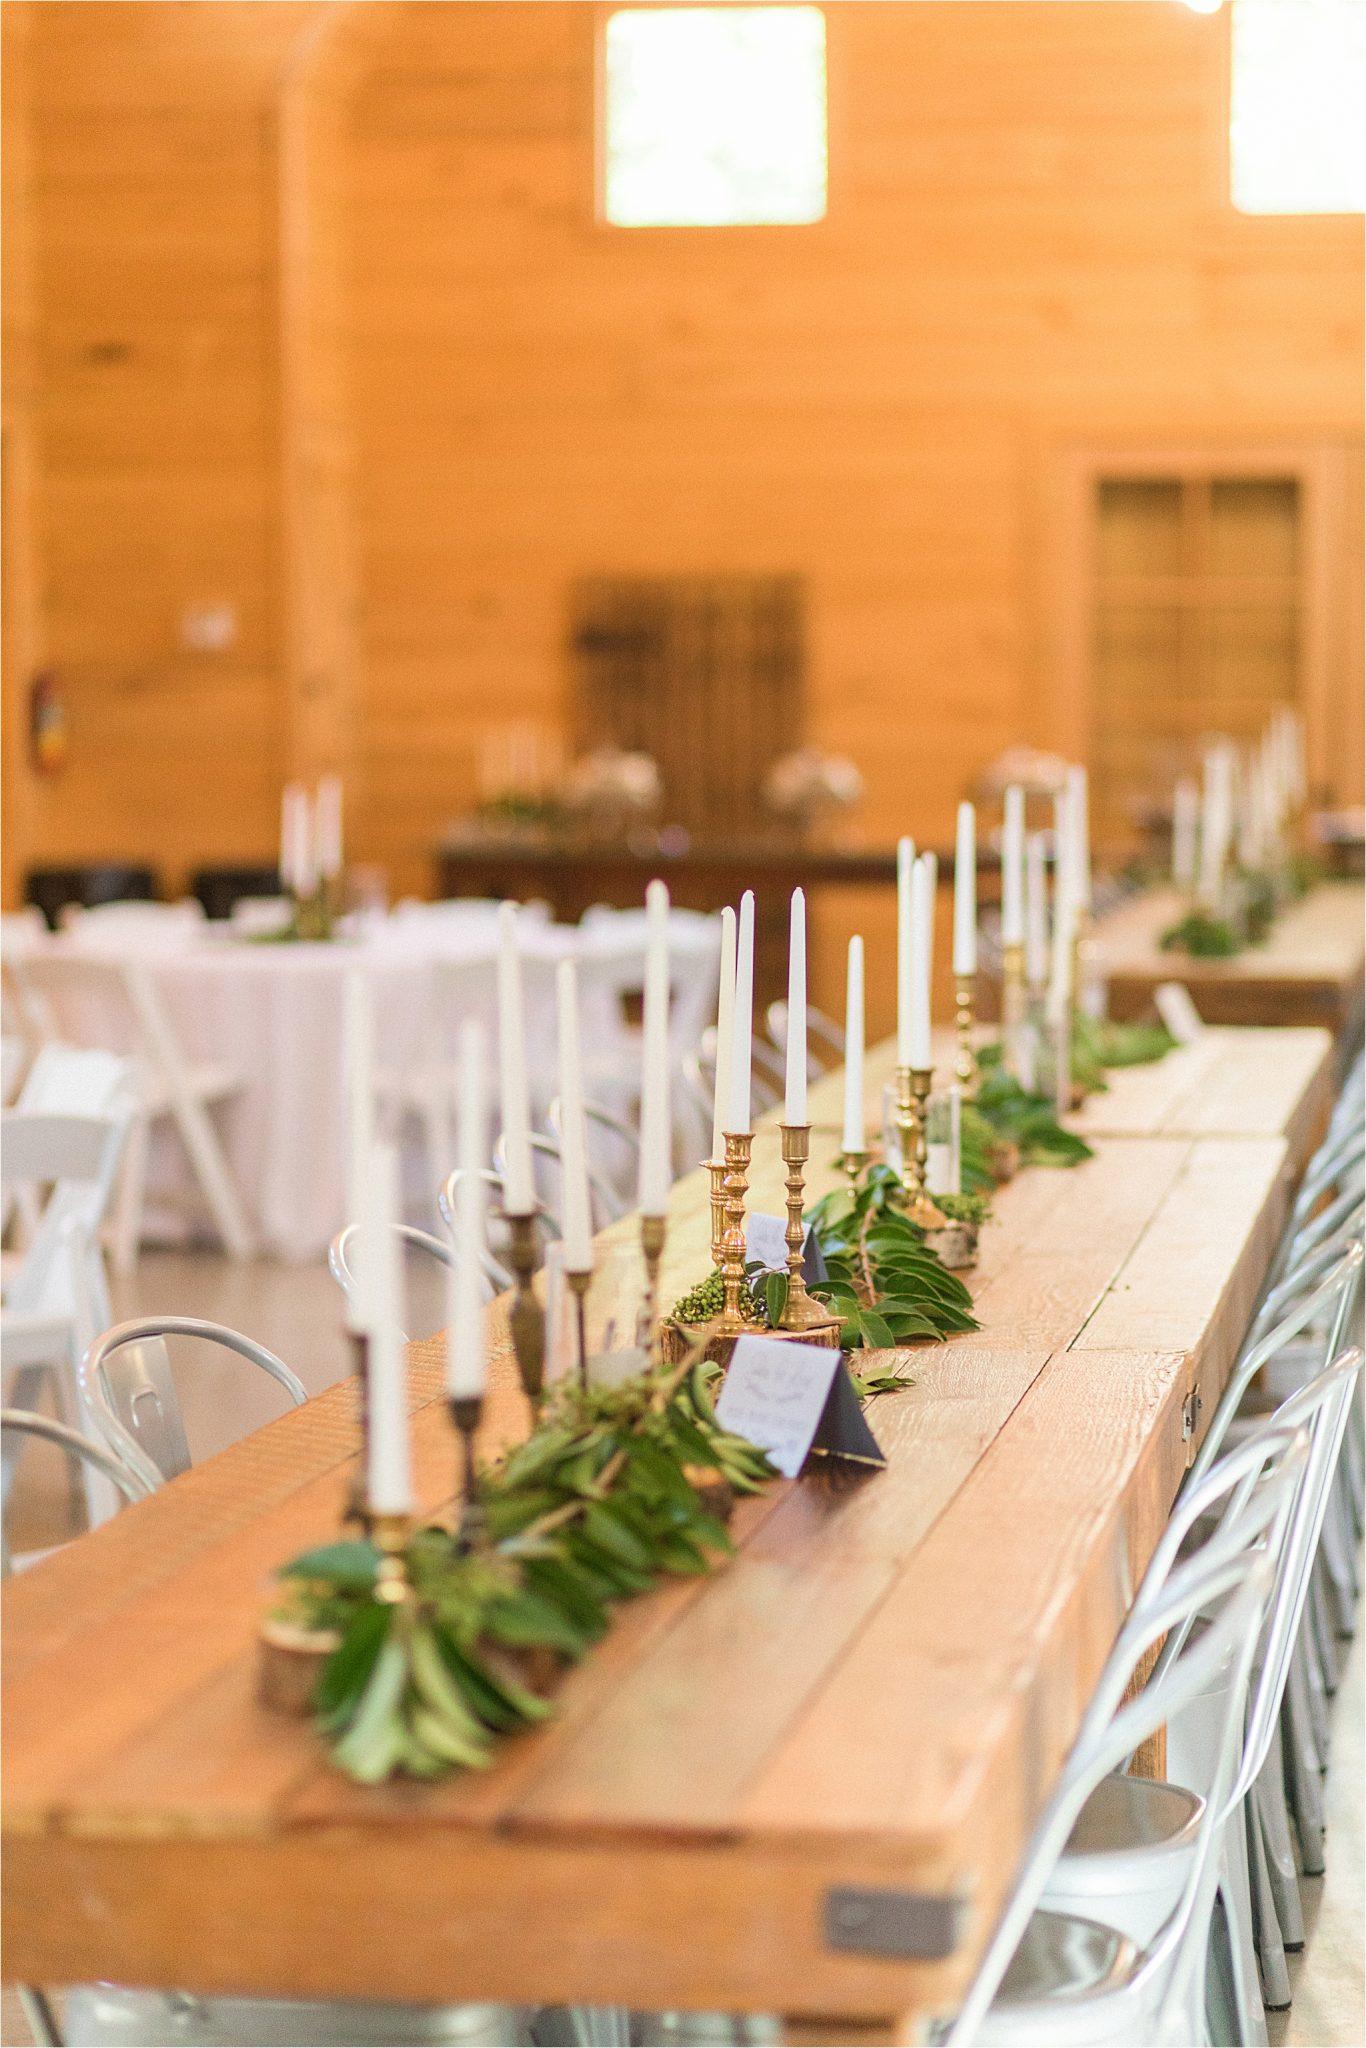 wedding-reception-alabama-venue-barn-farm-tables-metal-chairs-candle-centerpieces-gold-candlesticks